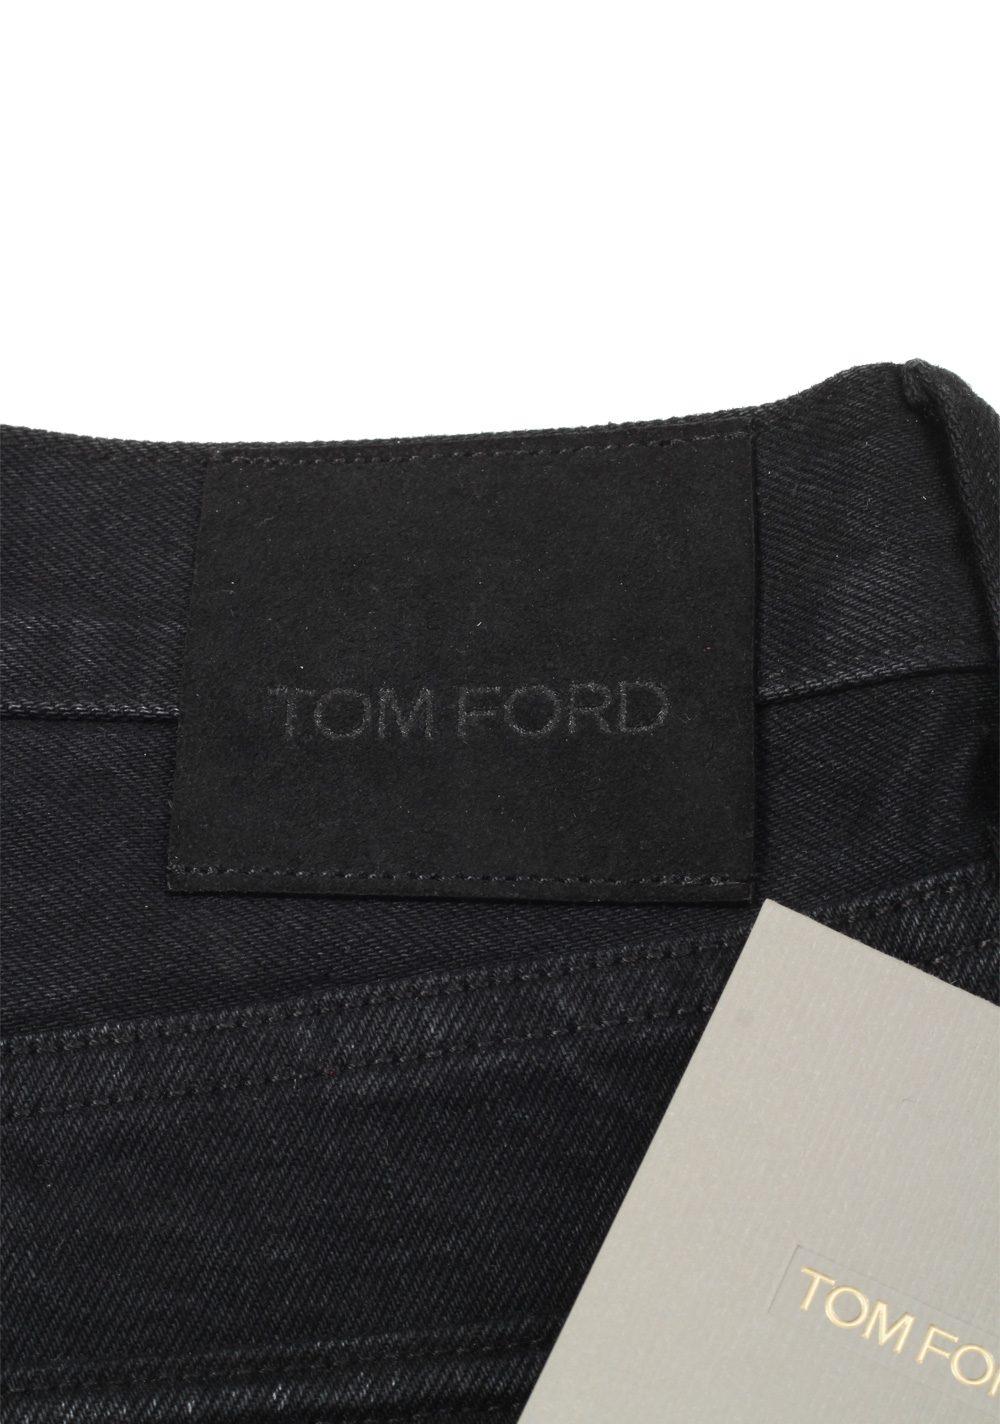 TOM FORD Black Straight Jeans TFD002 Size 46 / 30 U.S. | Costume Limité